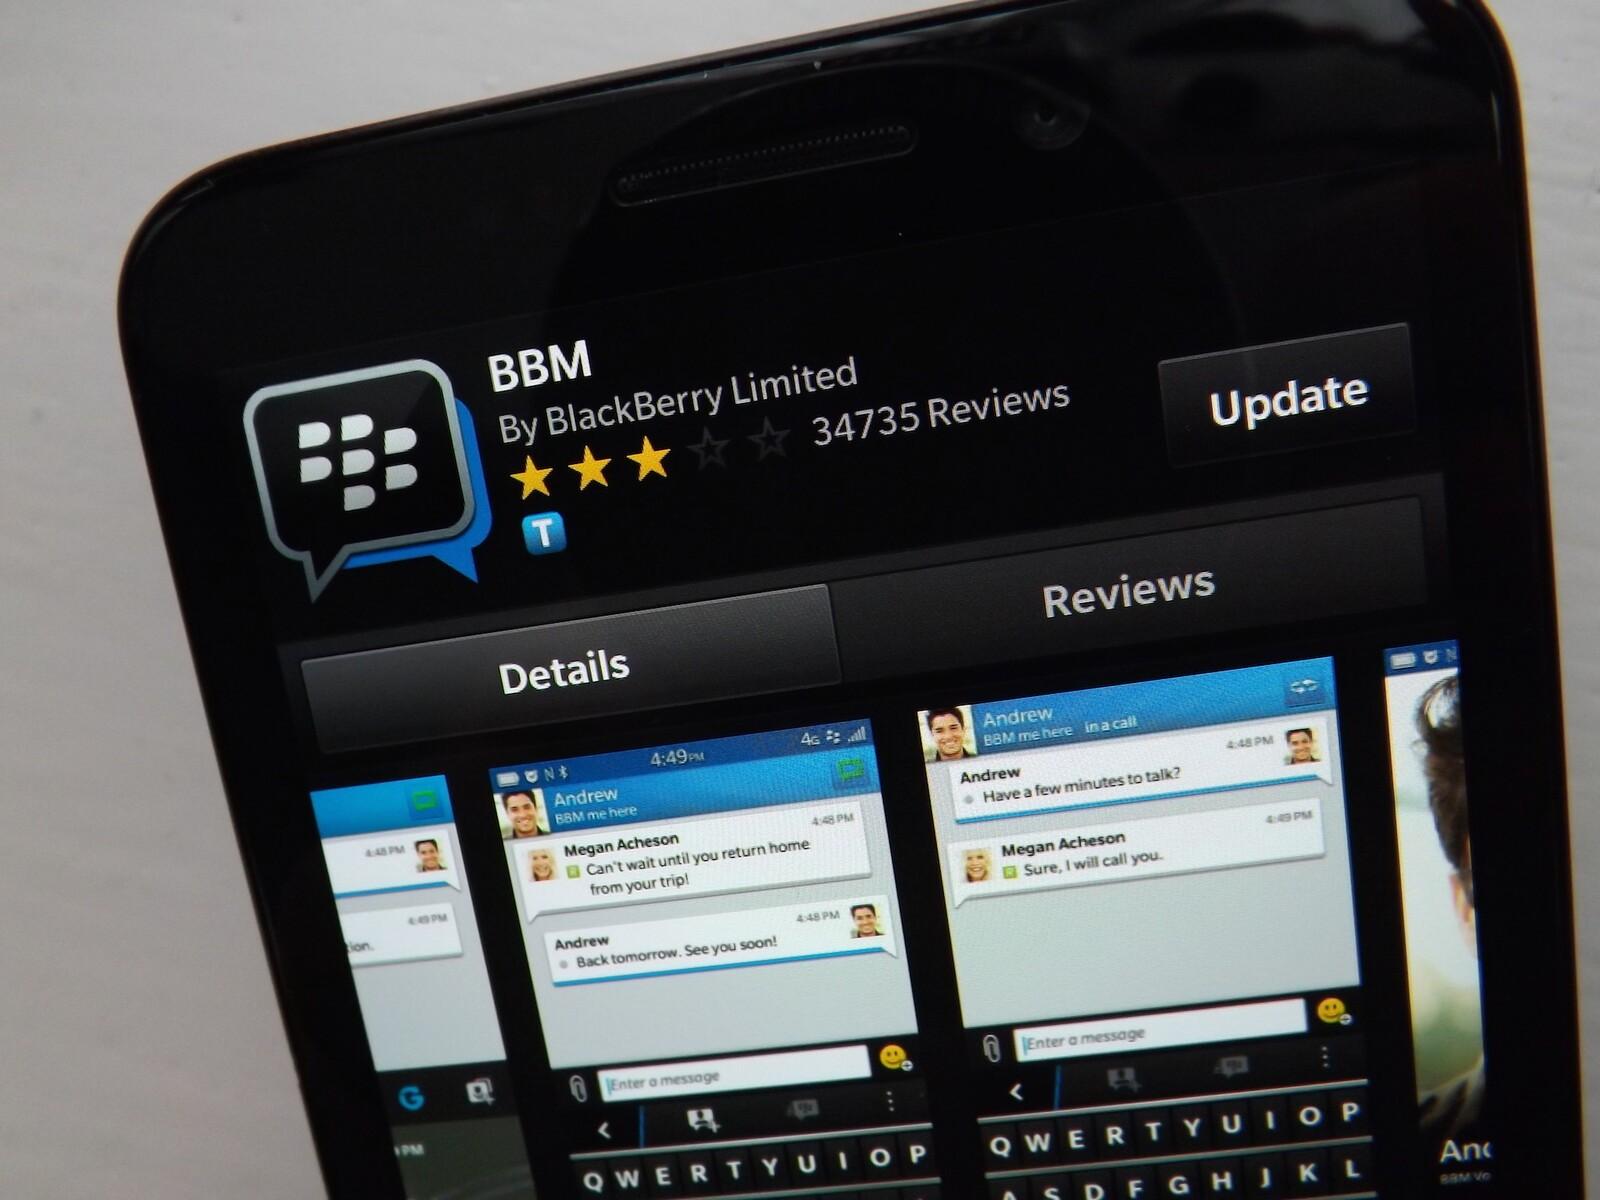 BlackBerry Messenger Consumer Service Sets To Shut Down